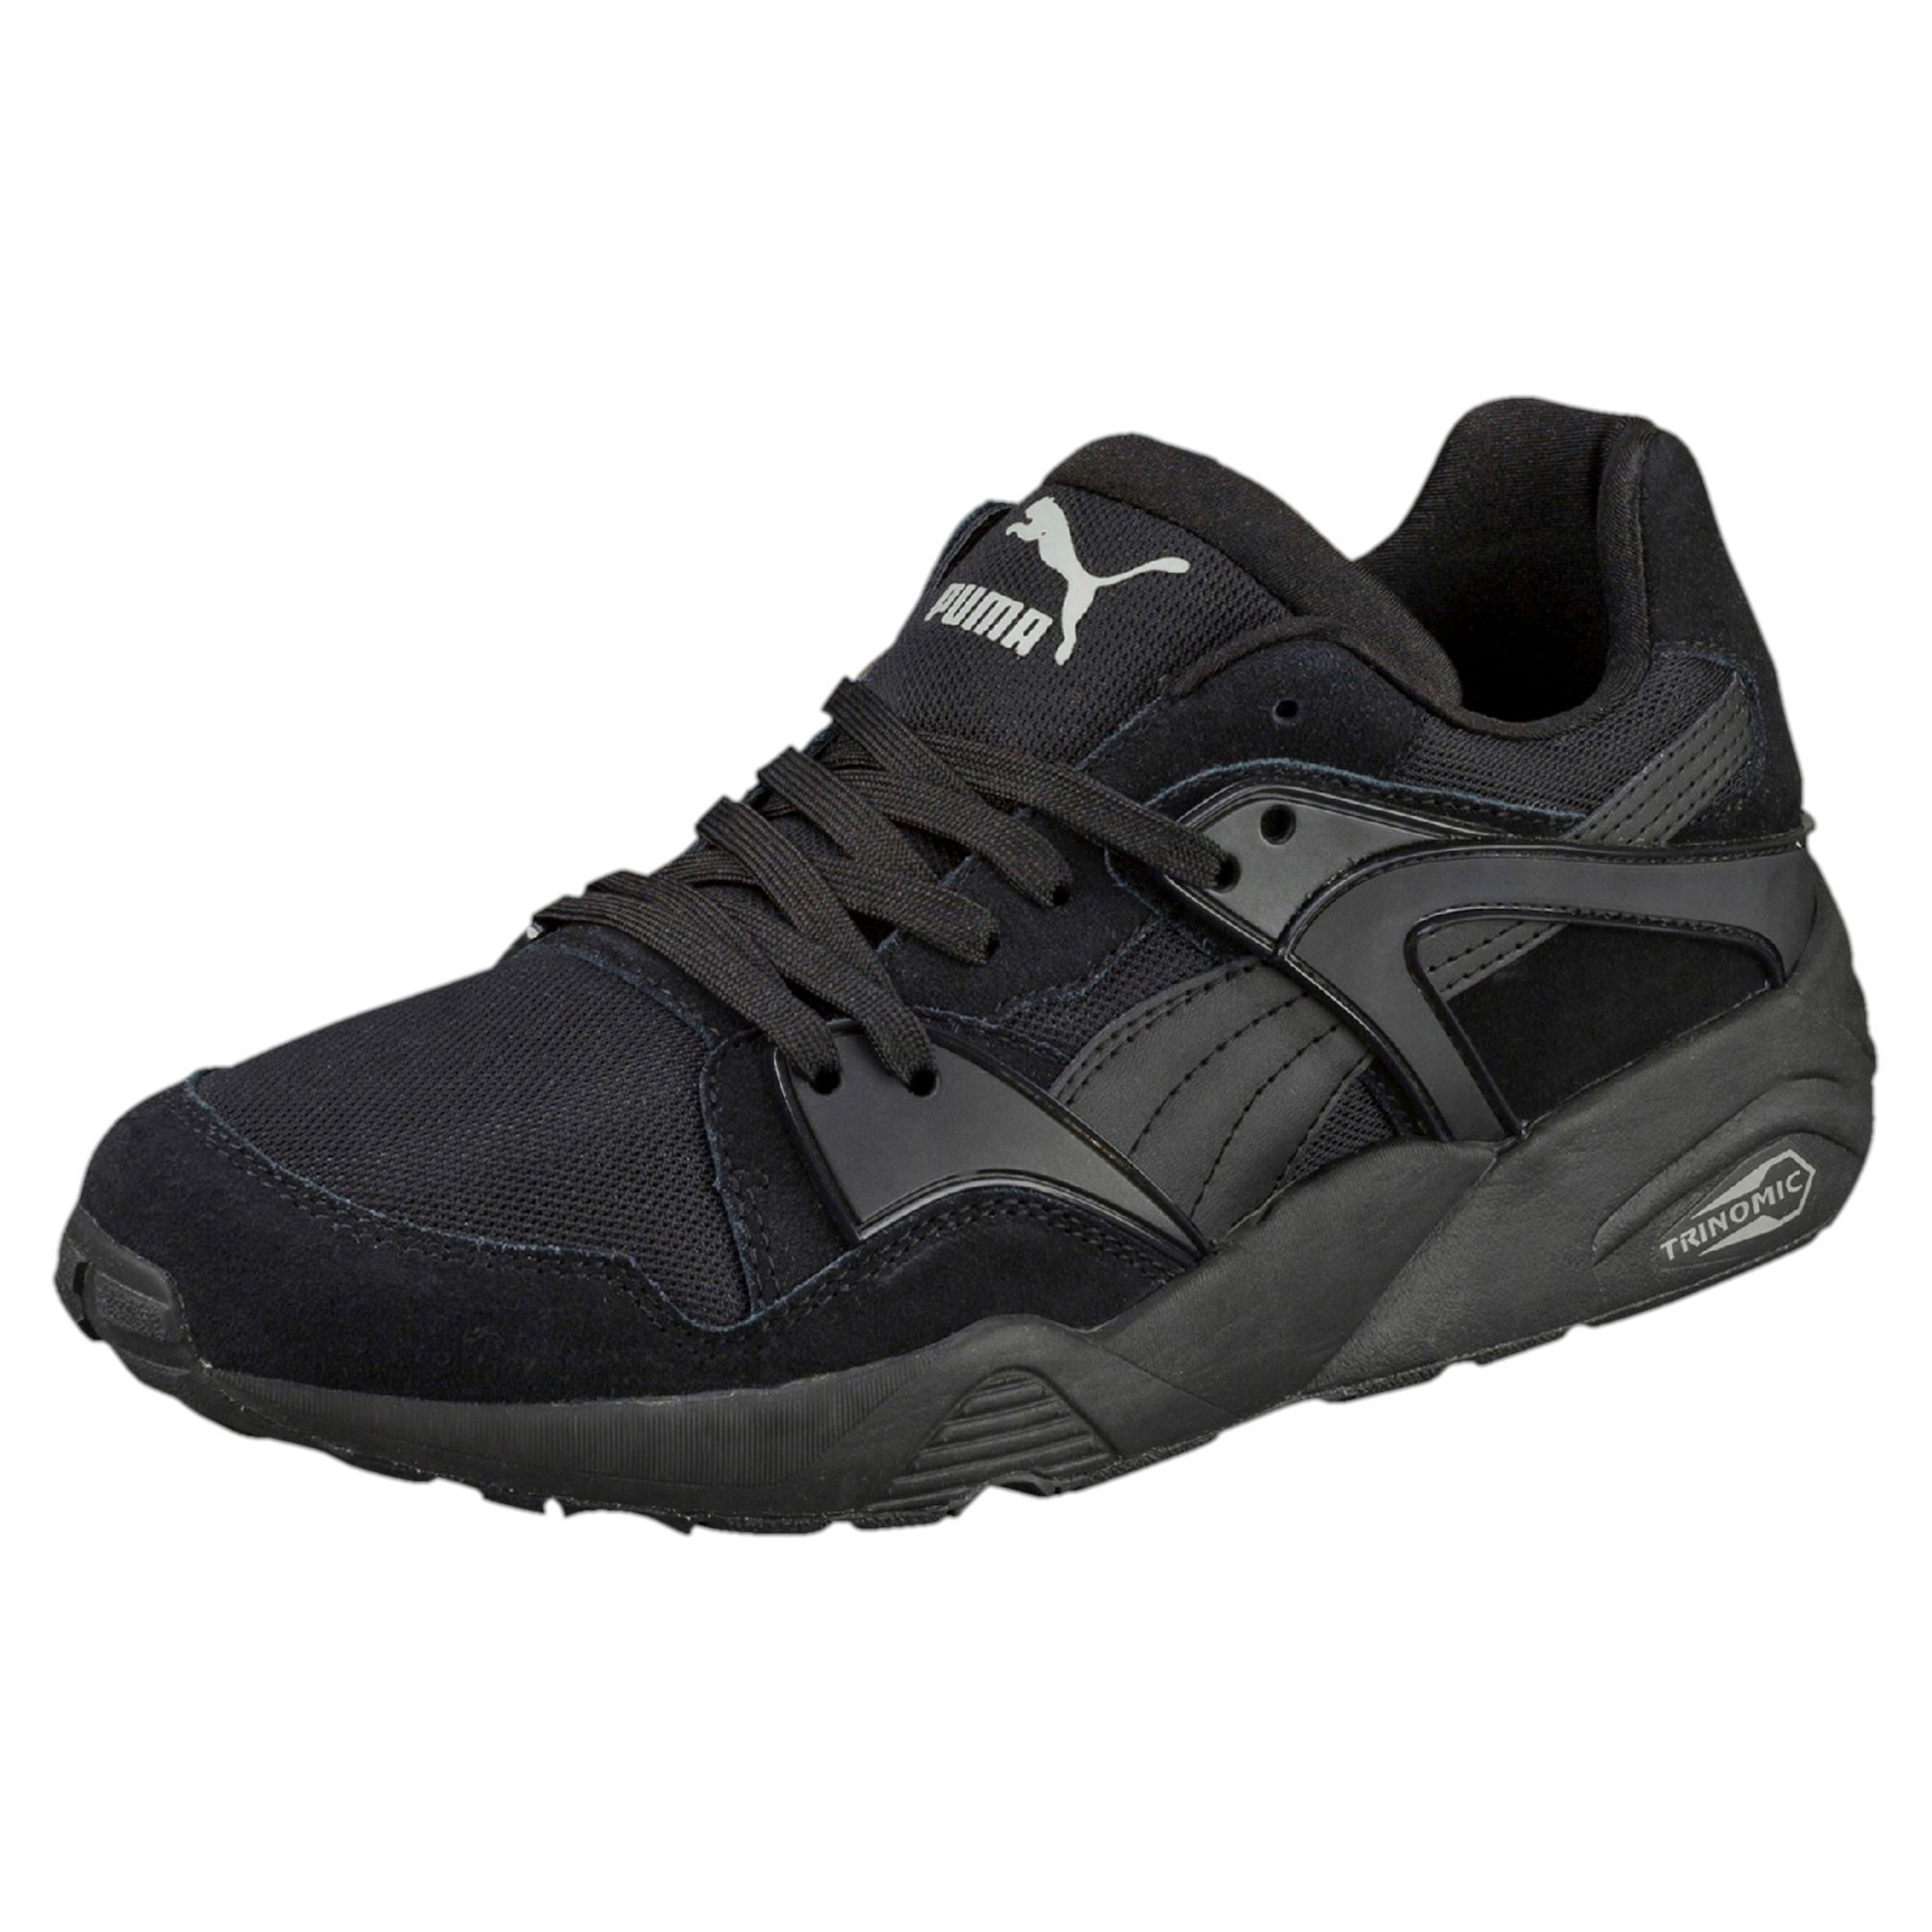 Ignite 3 Wns, Chaussures de Running Compétition Femme, Noir Black White 05, 38 EUPuma